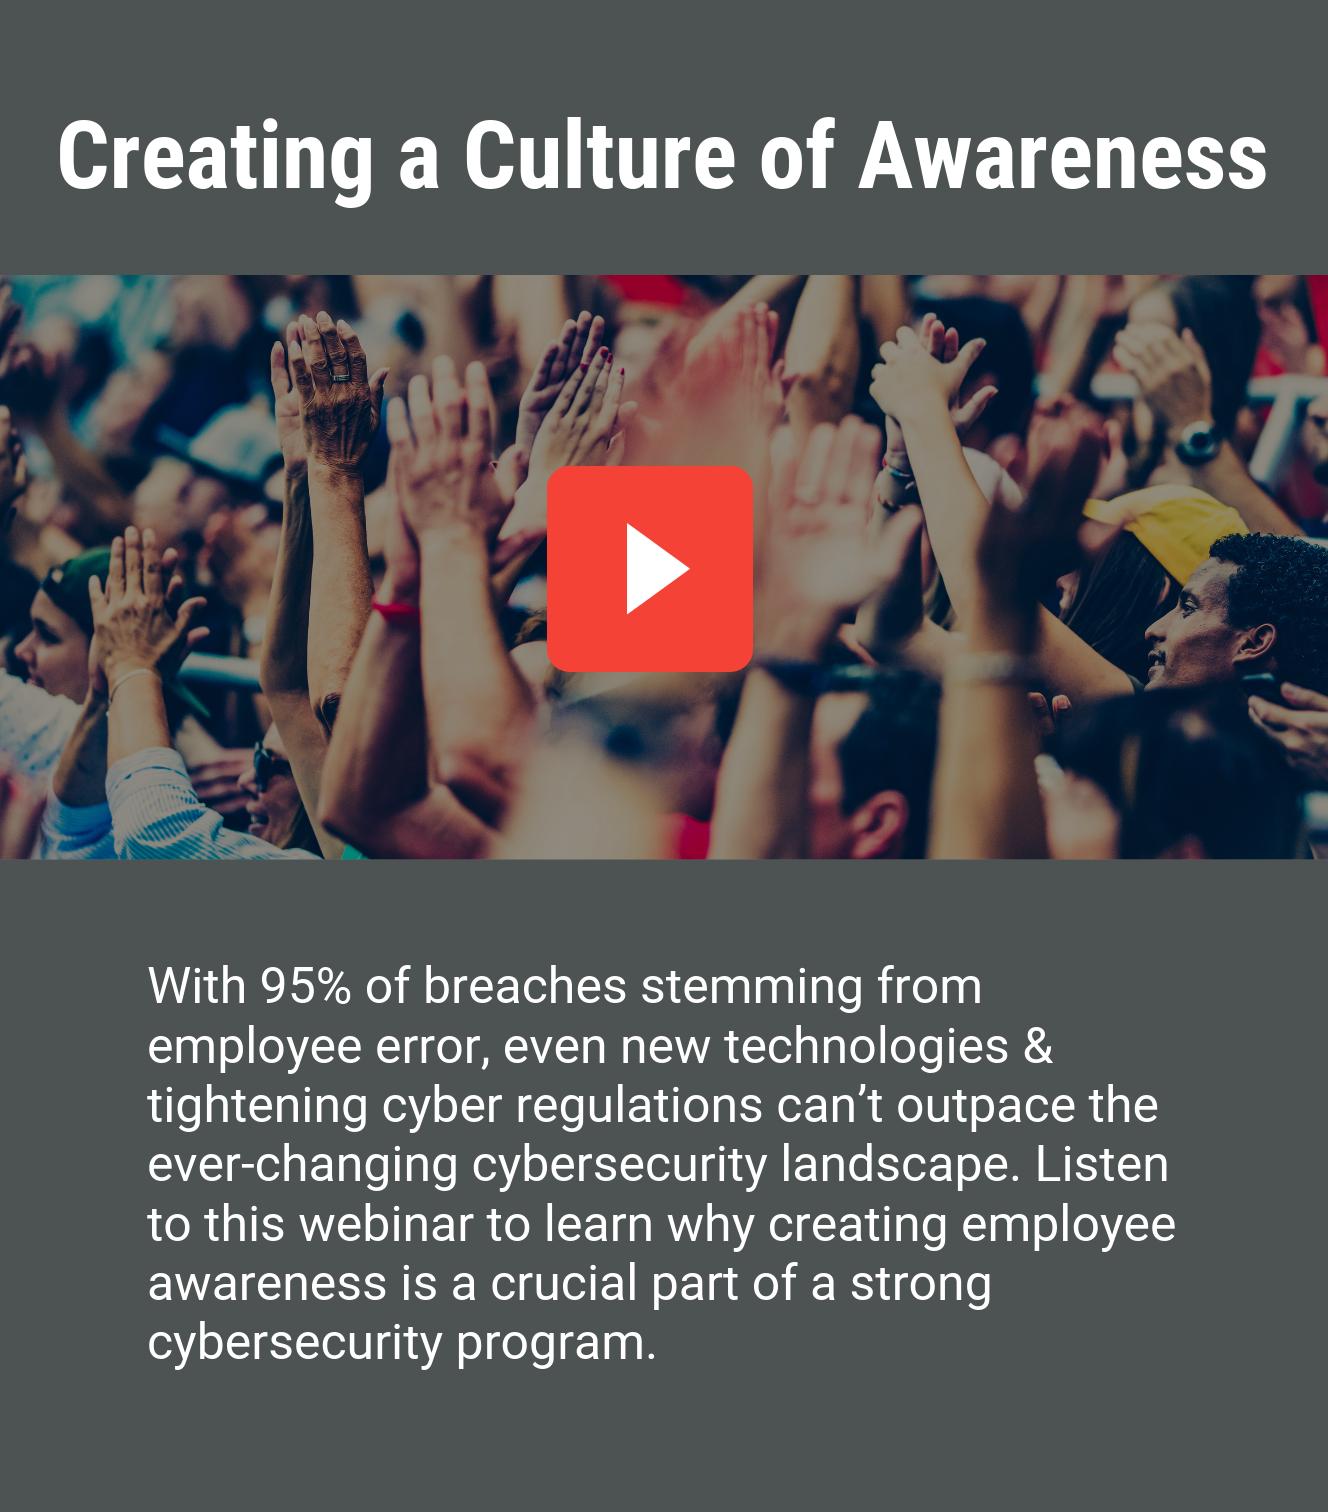 Creating Cybersecurity Awareness